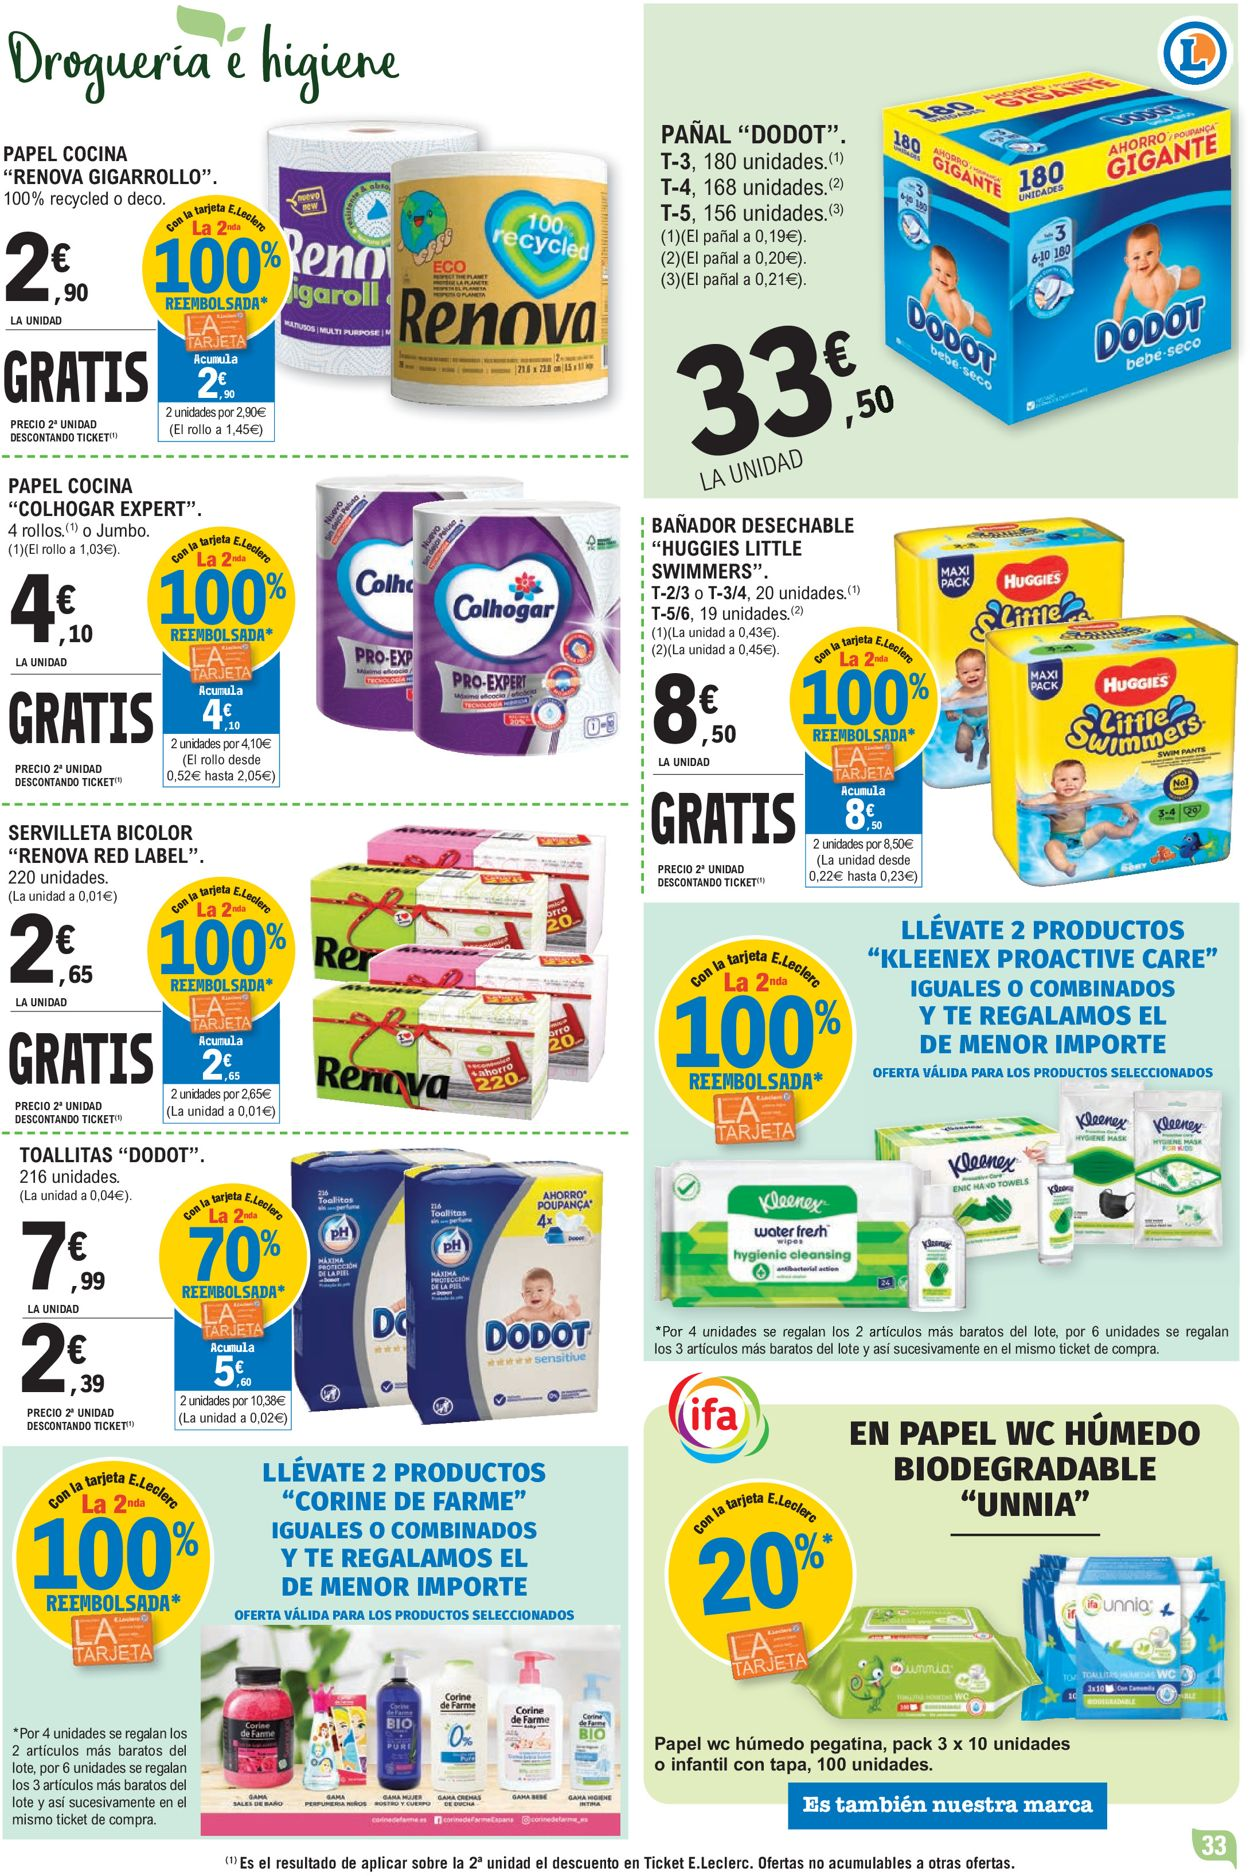 E.leclerc Folleto - 12.05-23.05.2021 (Página 33)